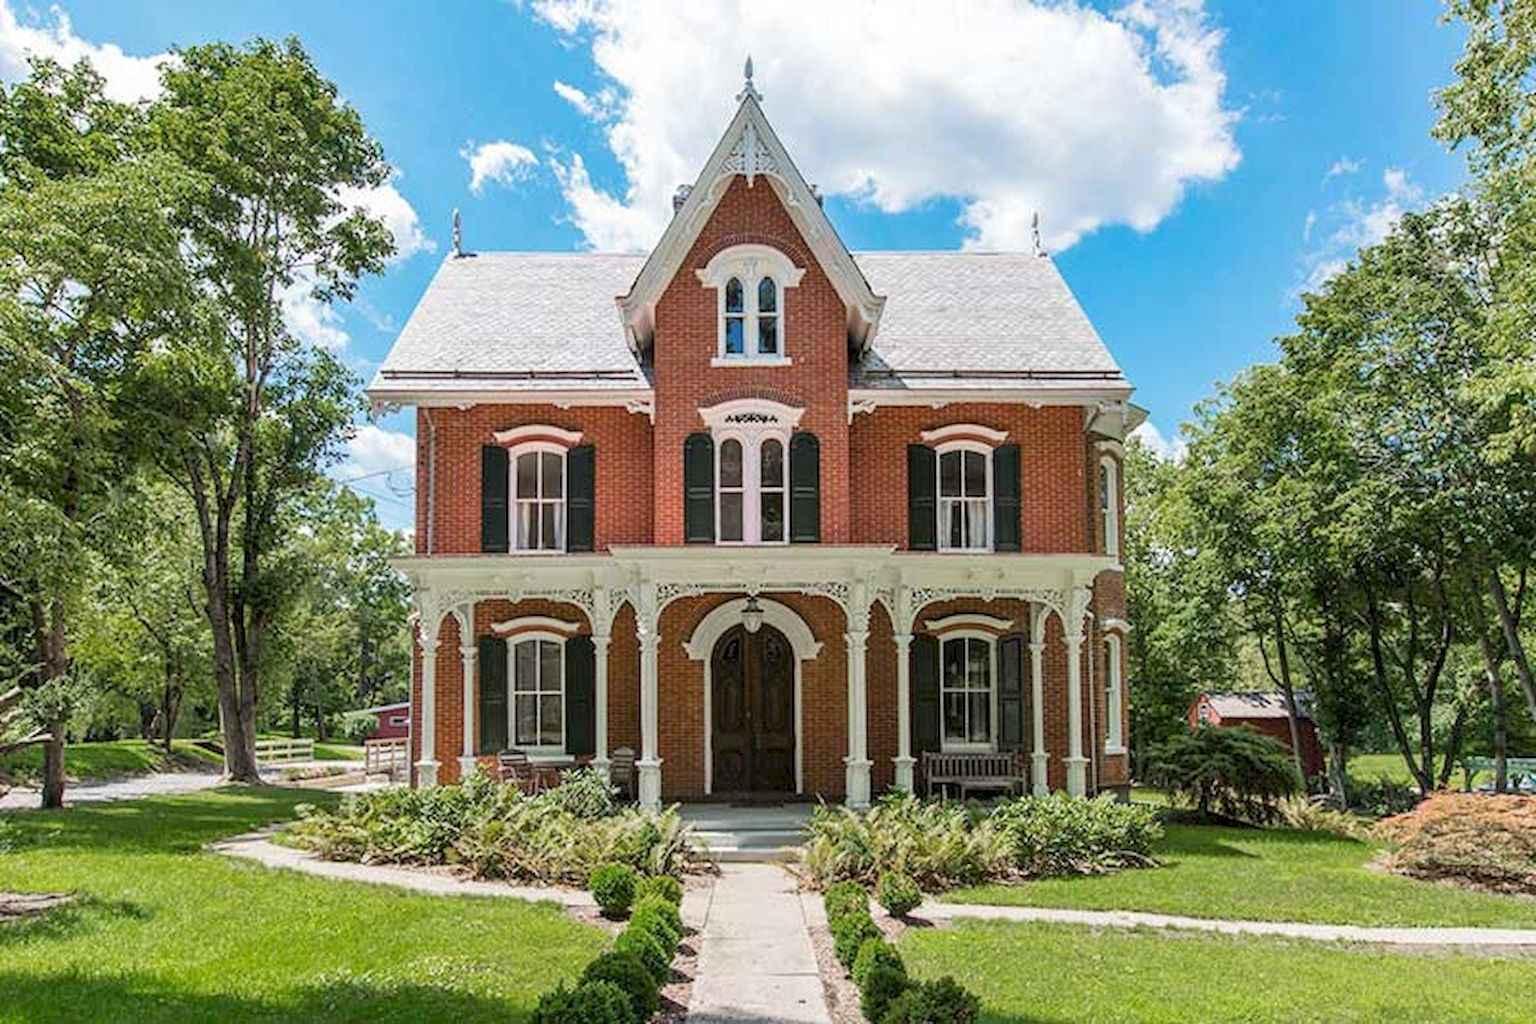 80 awesome victorian farmhouse plans design ideas (15)